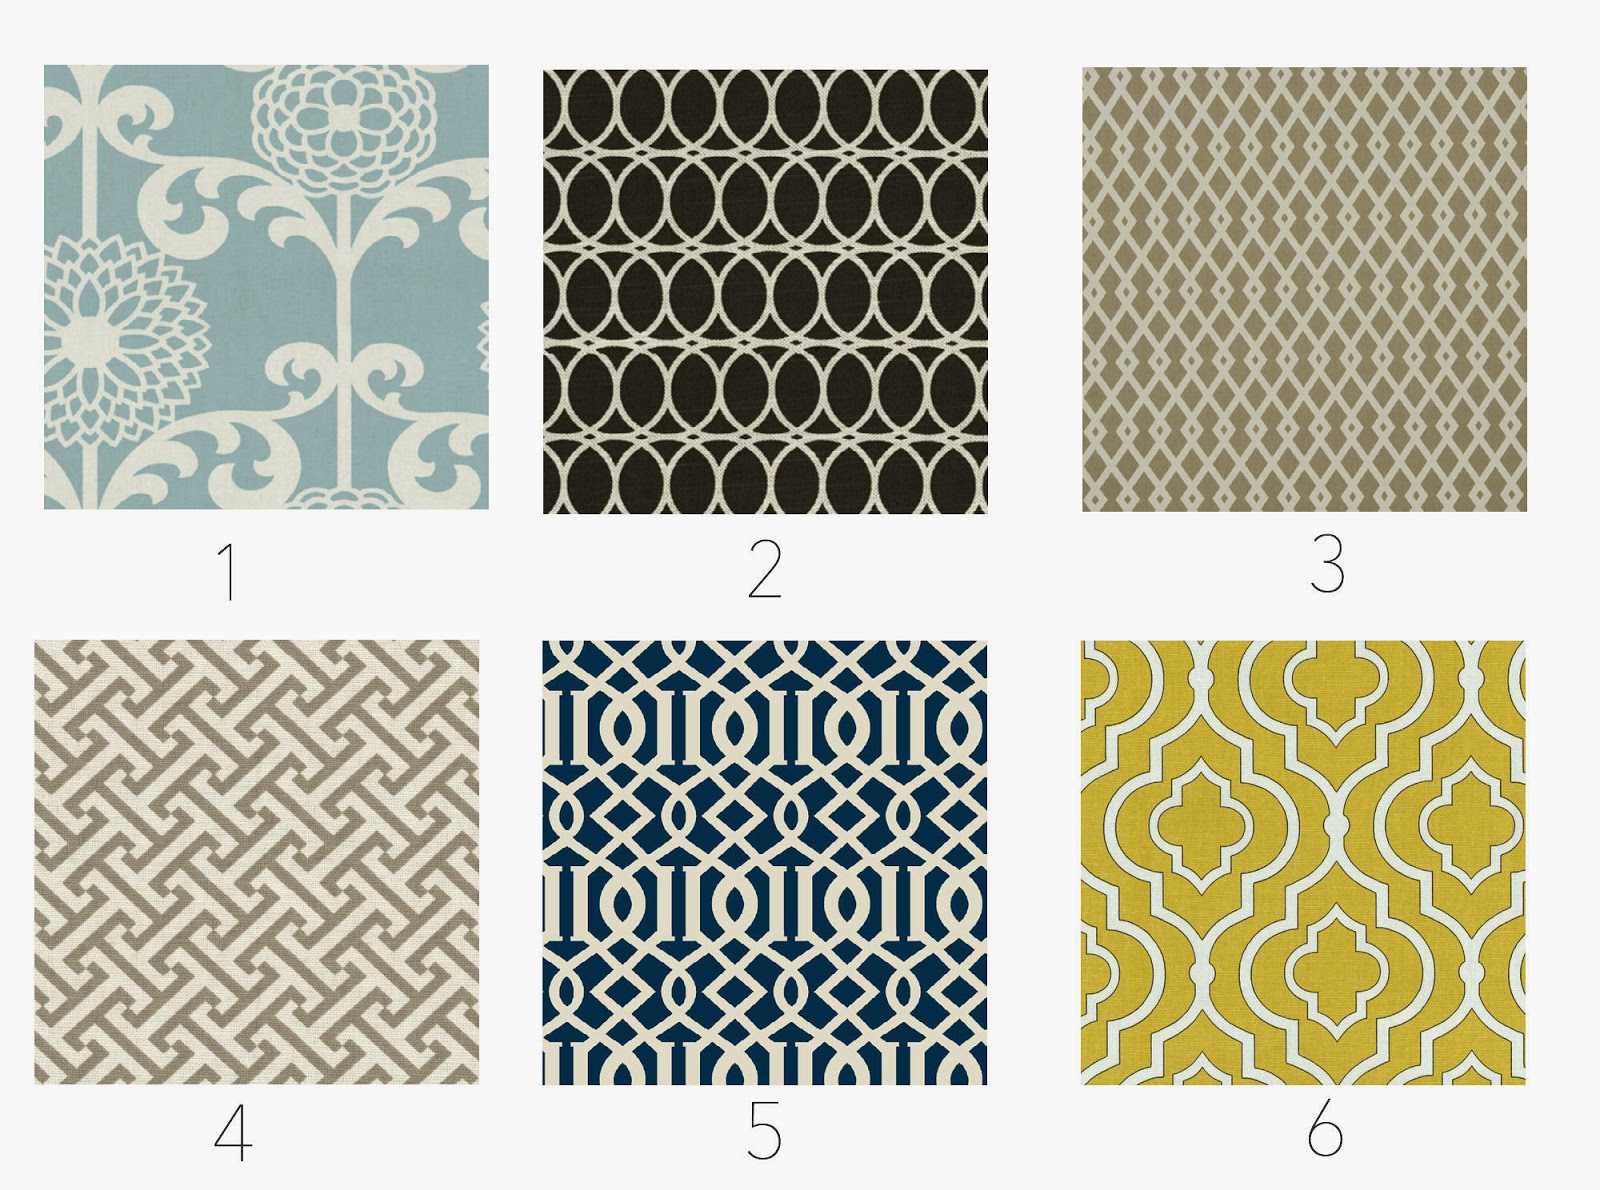 Favorite Home Decor Fabric At Joann Fabrics Little House Of